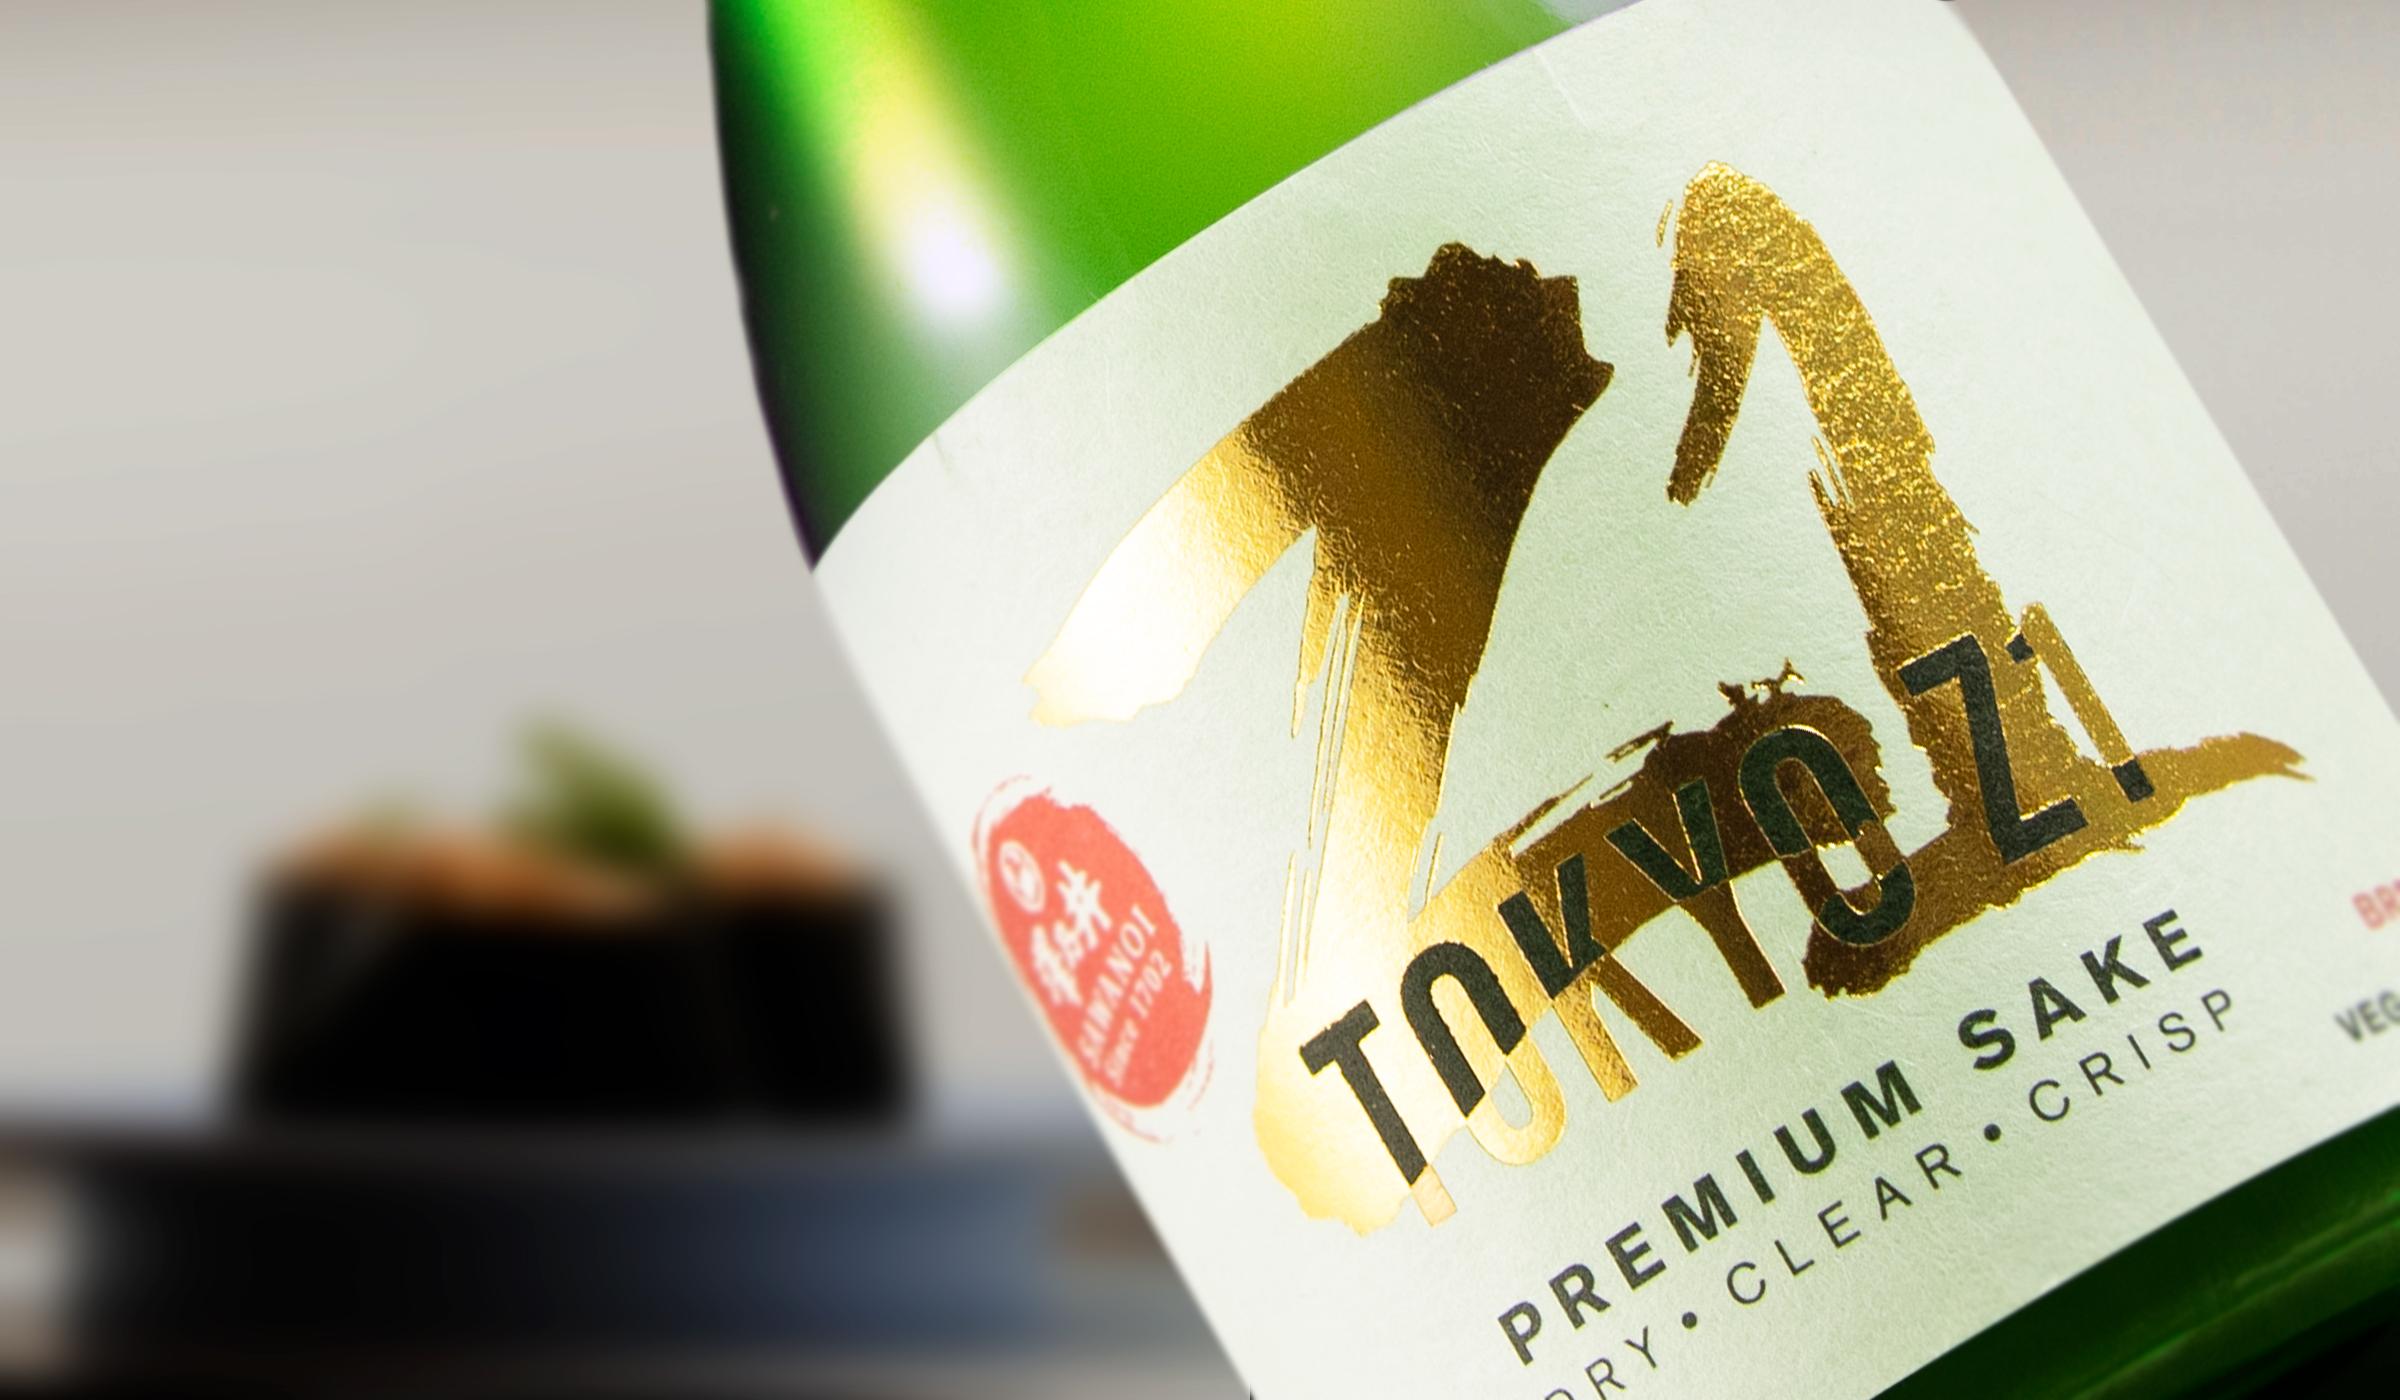 P&W Designs First Japanese Sake Brand for UK Market